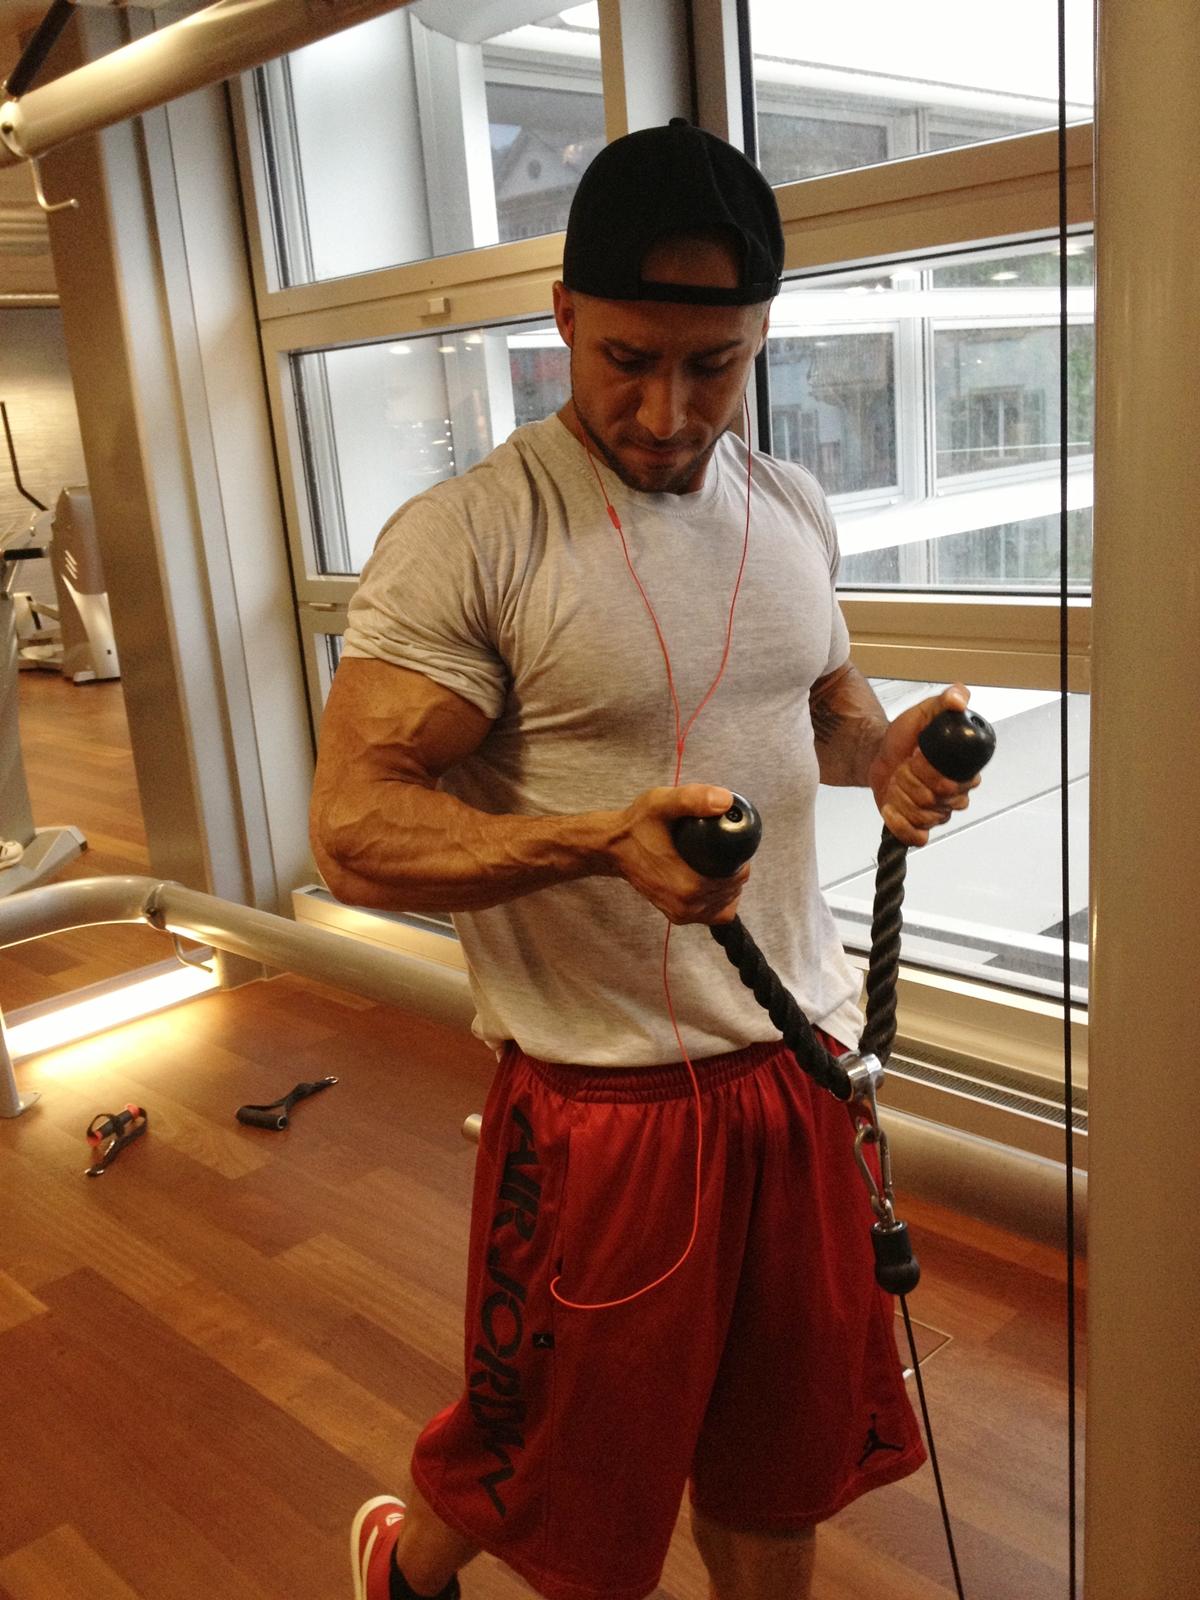 fitnessausbildung schweiz